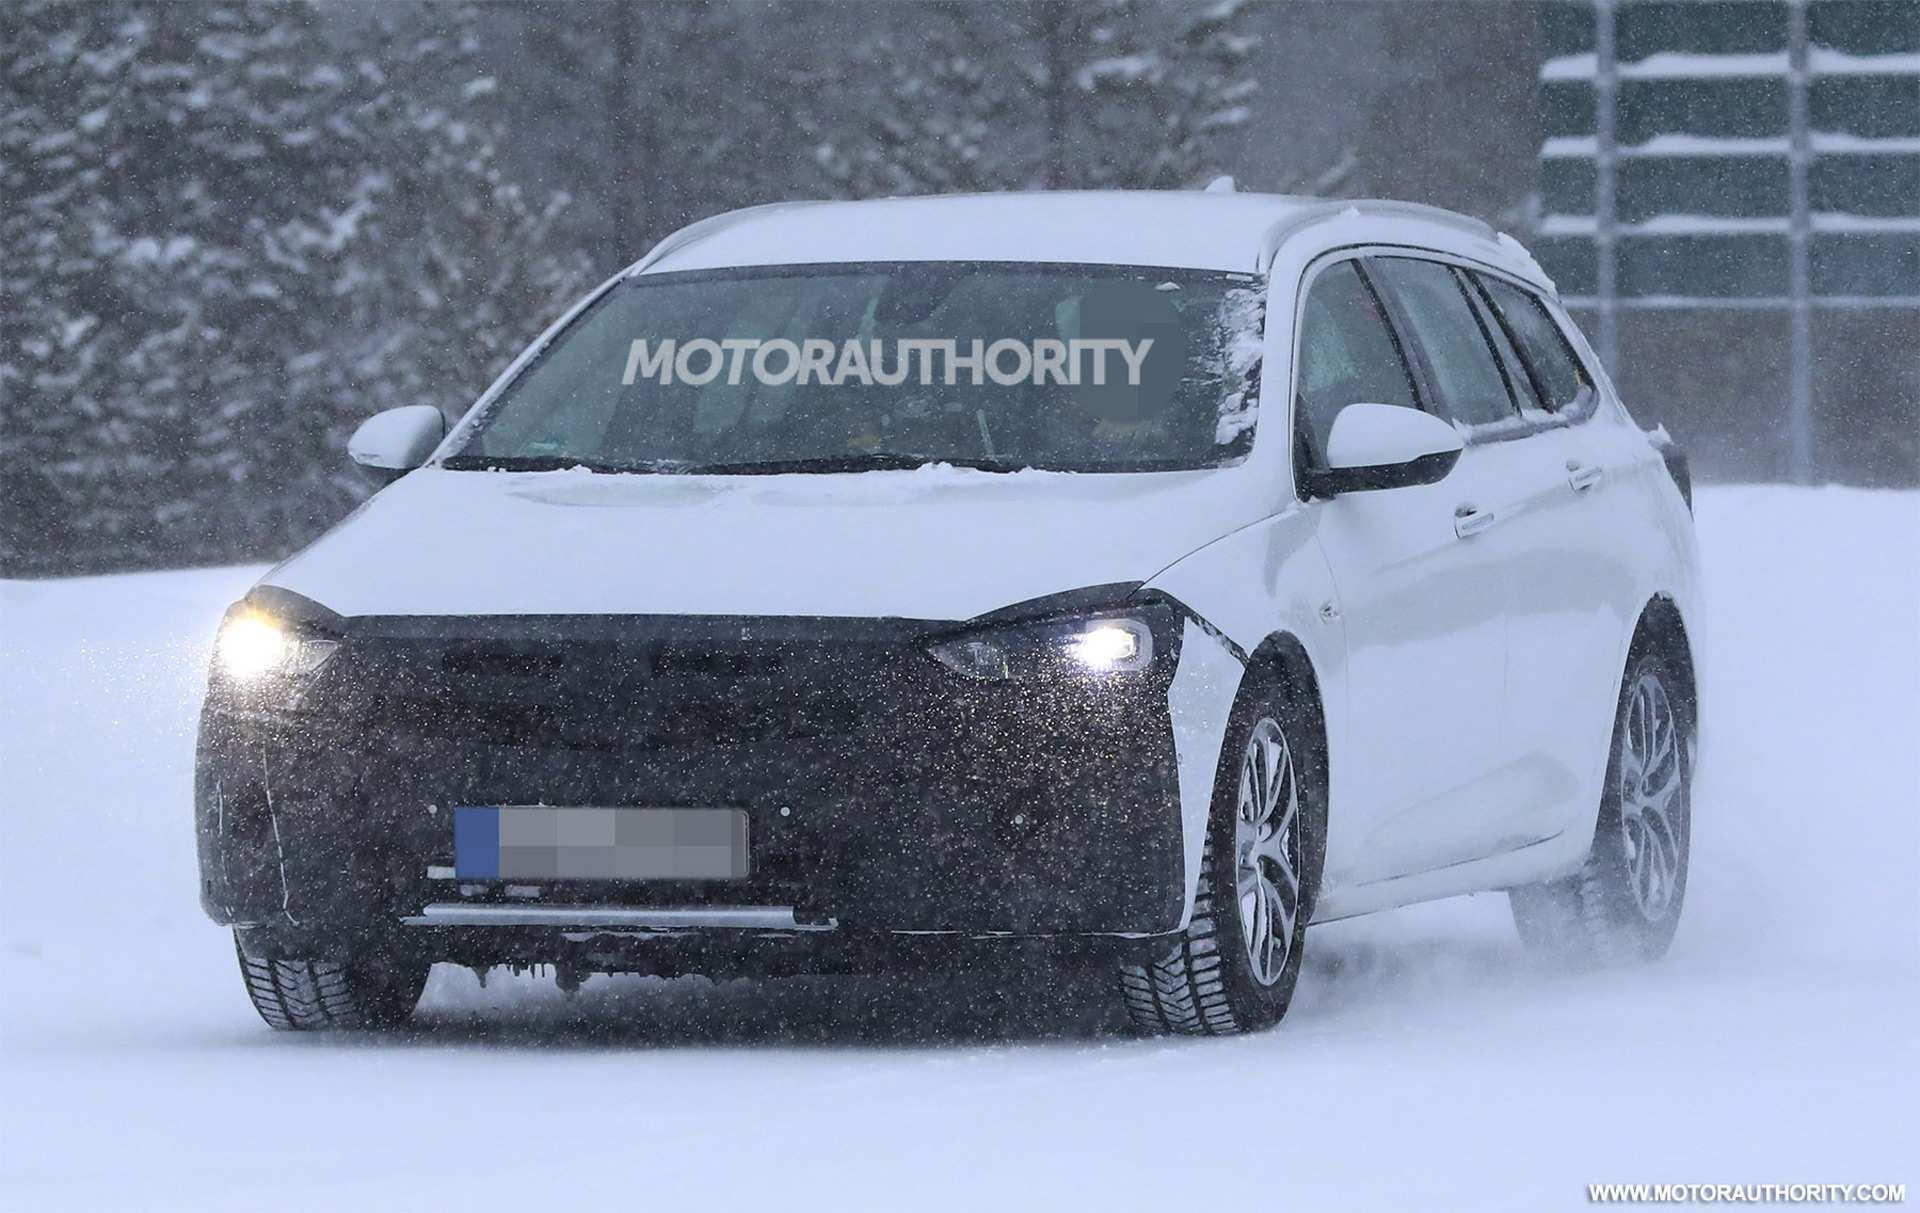 65 All New Opel Insignia Sports Tourer 2020 Exterior and Interior with Opel Insignia Sports Tourer 2020